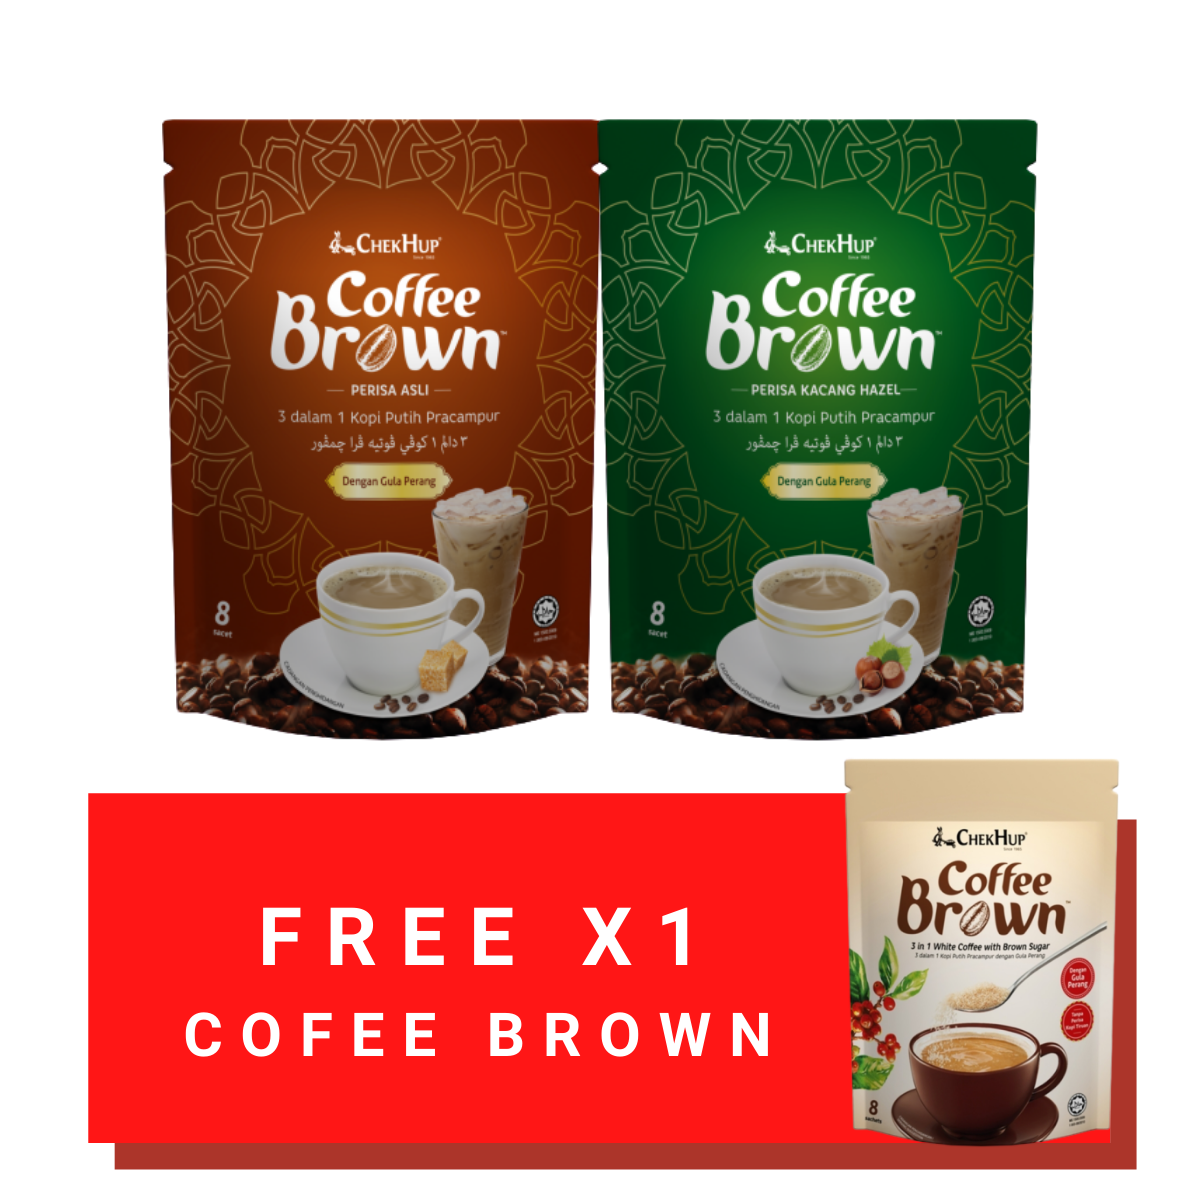 Chek Hup Coffee Brown